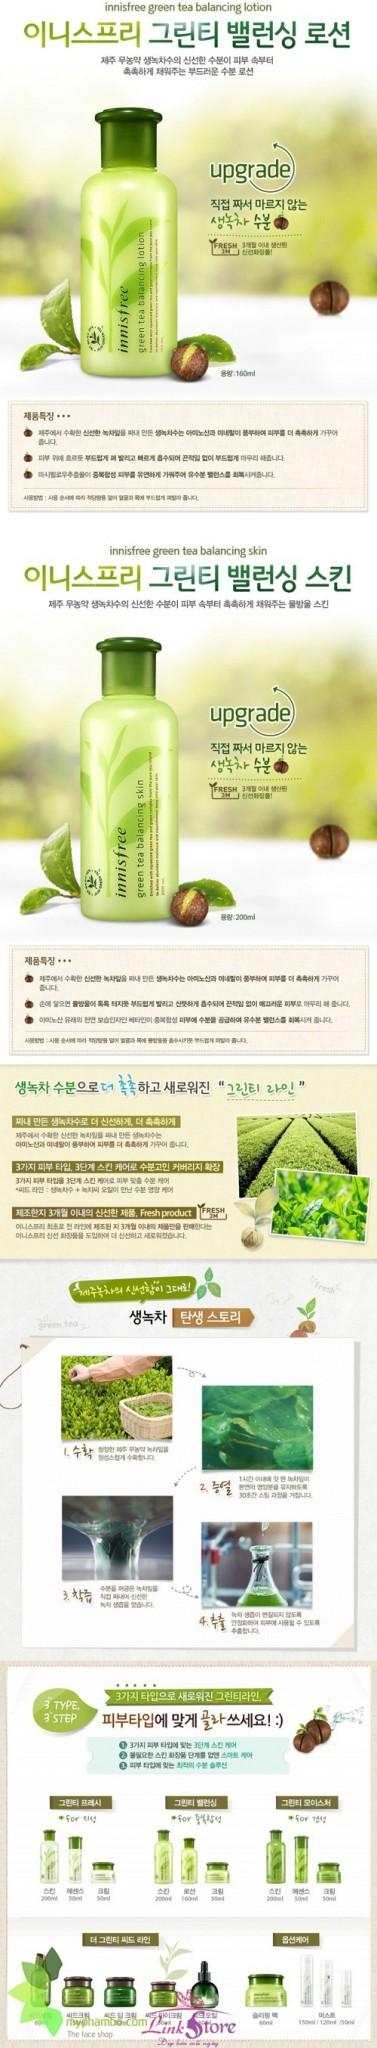 Bo duong tra xanh Innisfree Green Tea Balancing Special Skin Care Set - Han quoc (4)